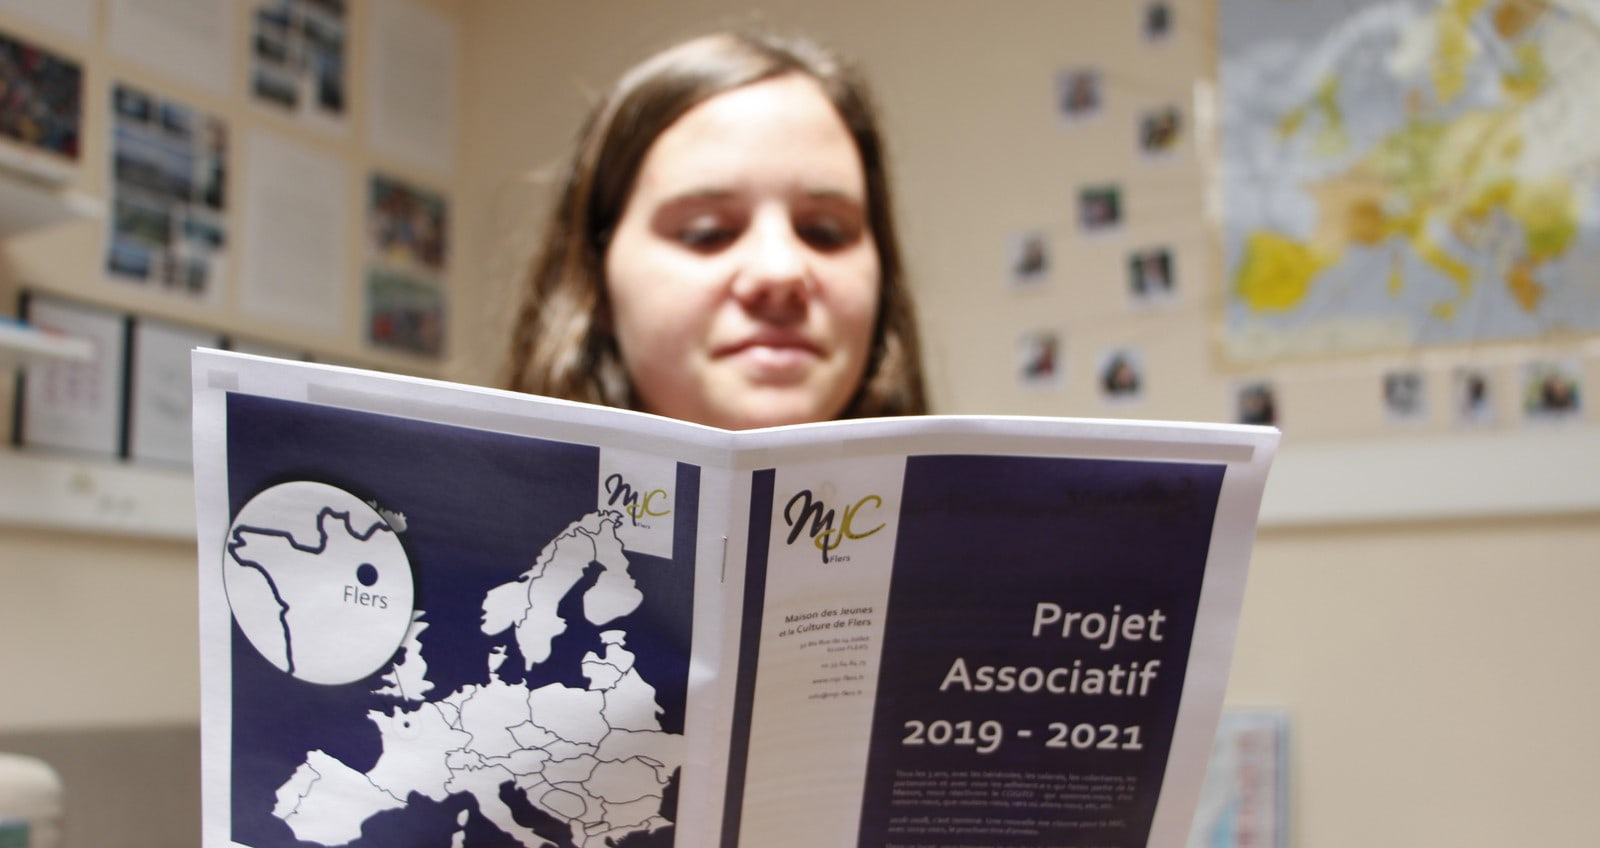 L'asso : Projet Associatif 2019 – 2021